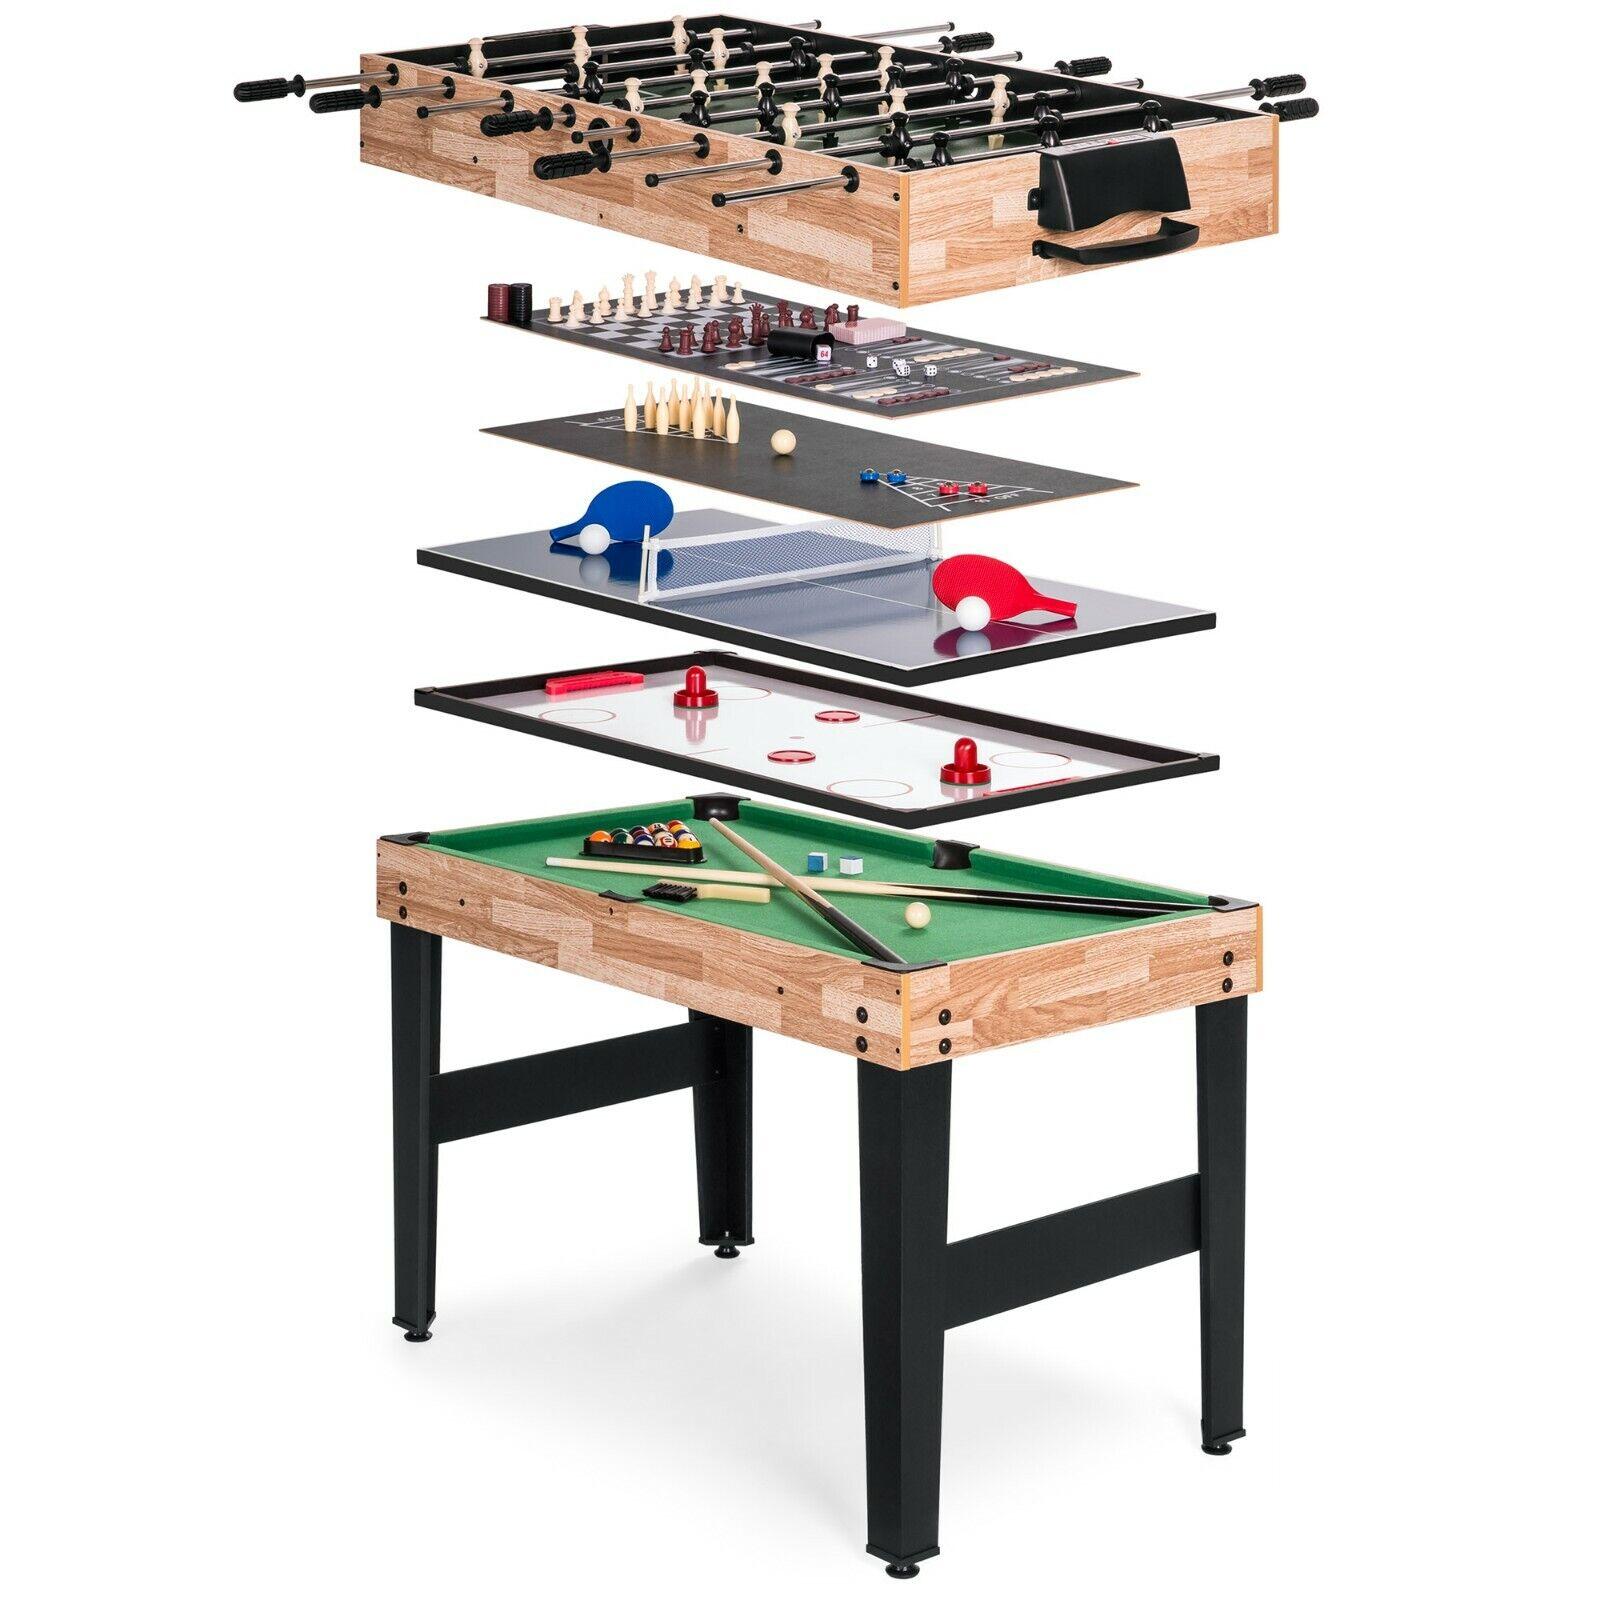 NEW 10-in-1 Combo Game Table Set w/ Billiards, Foosball, Pin